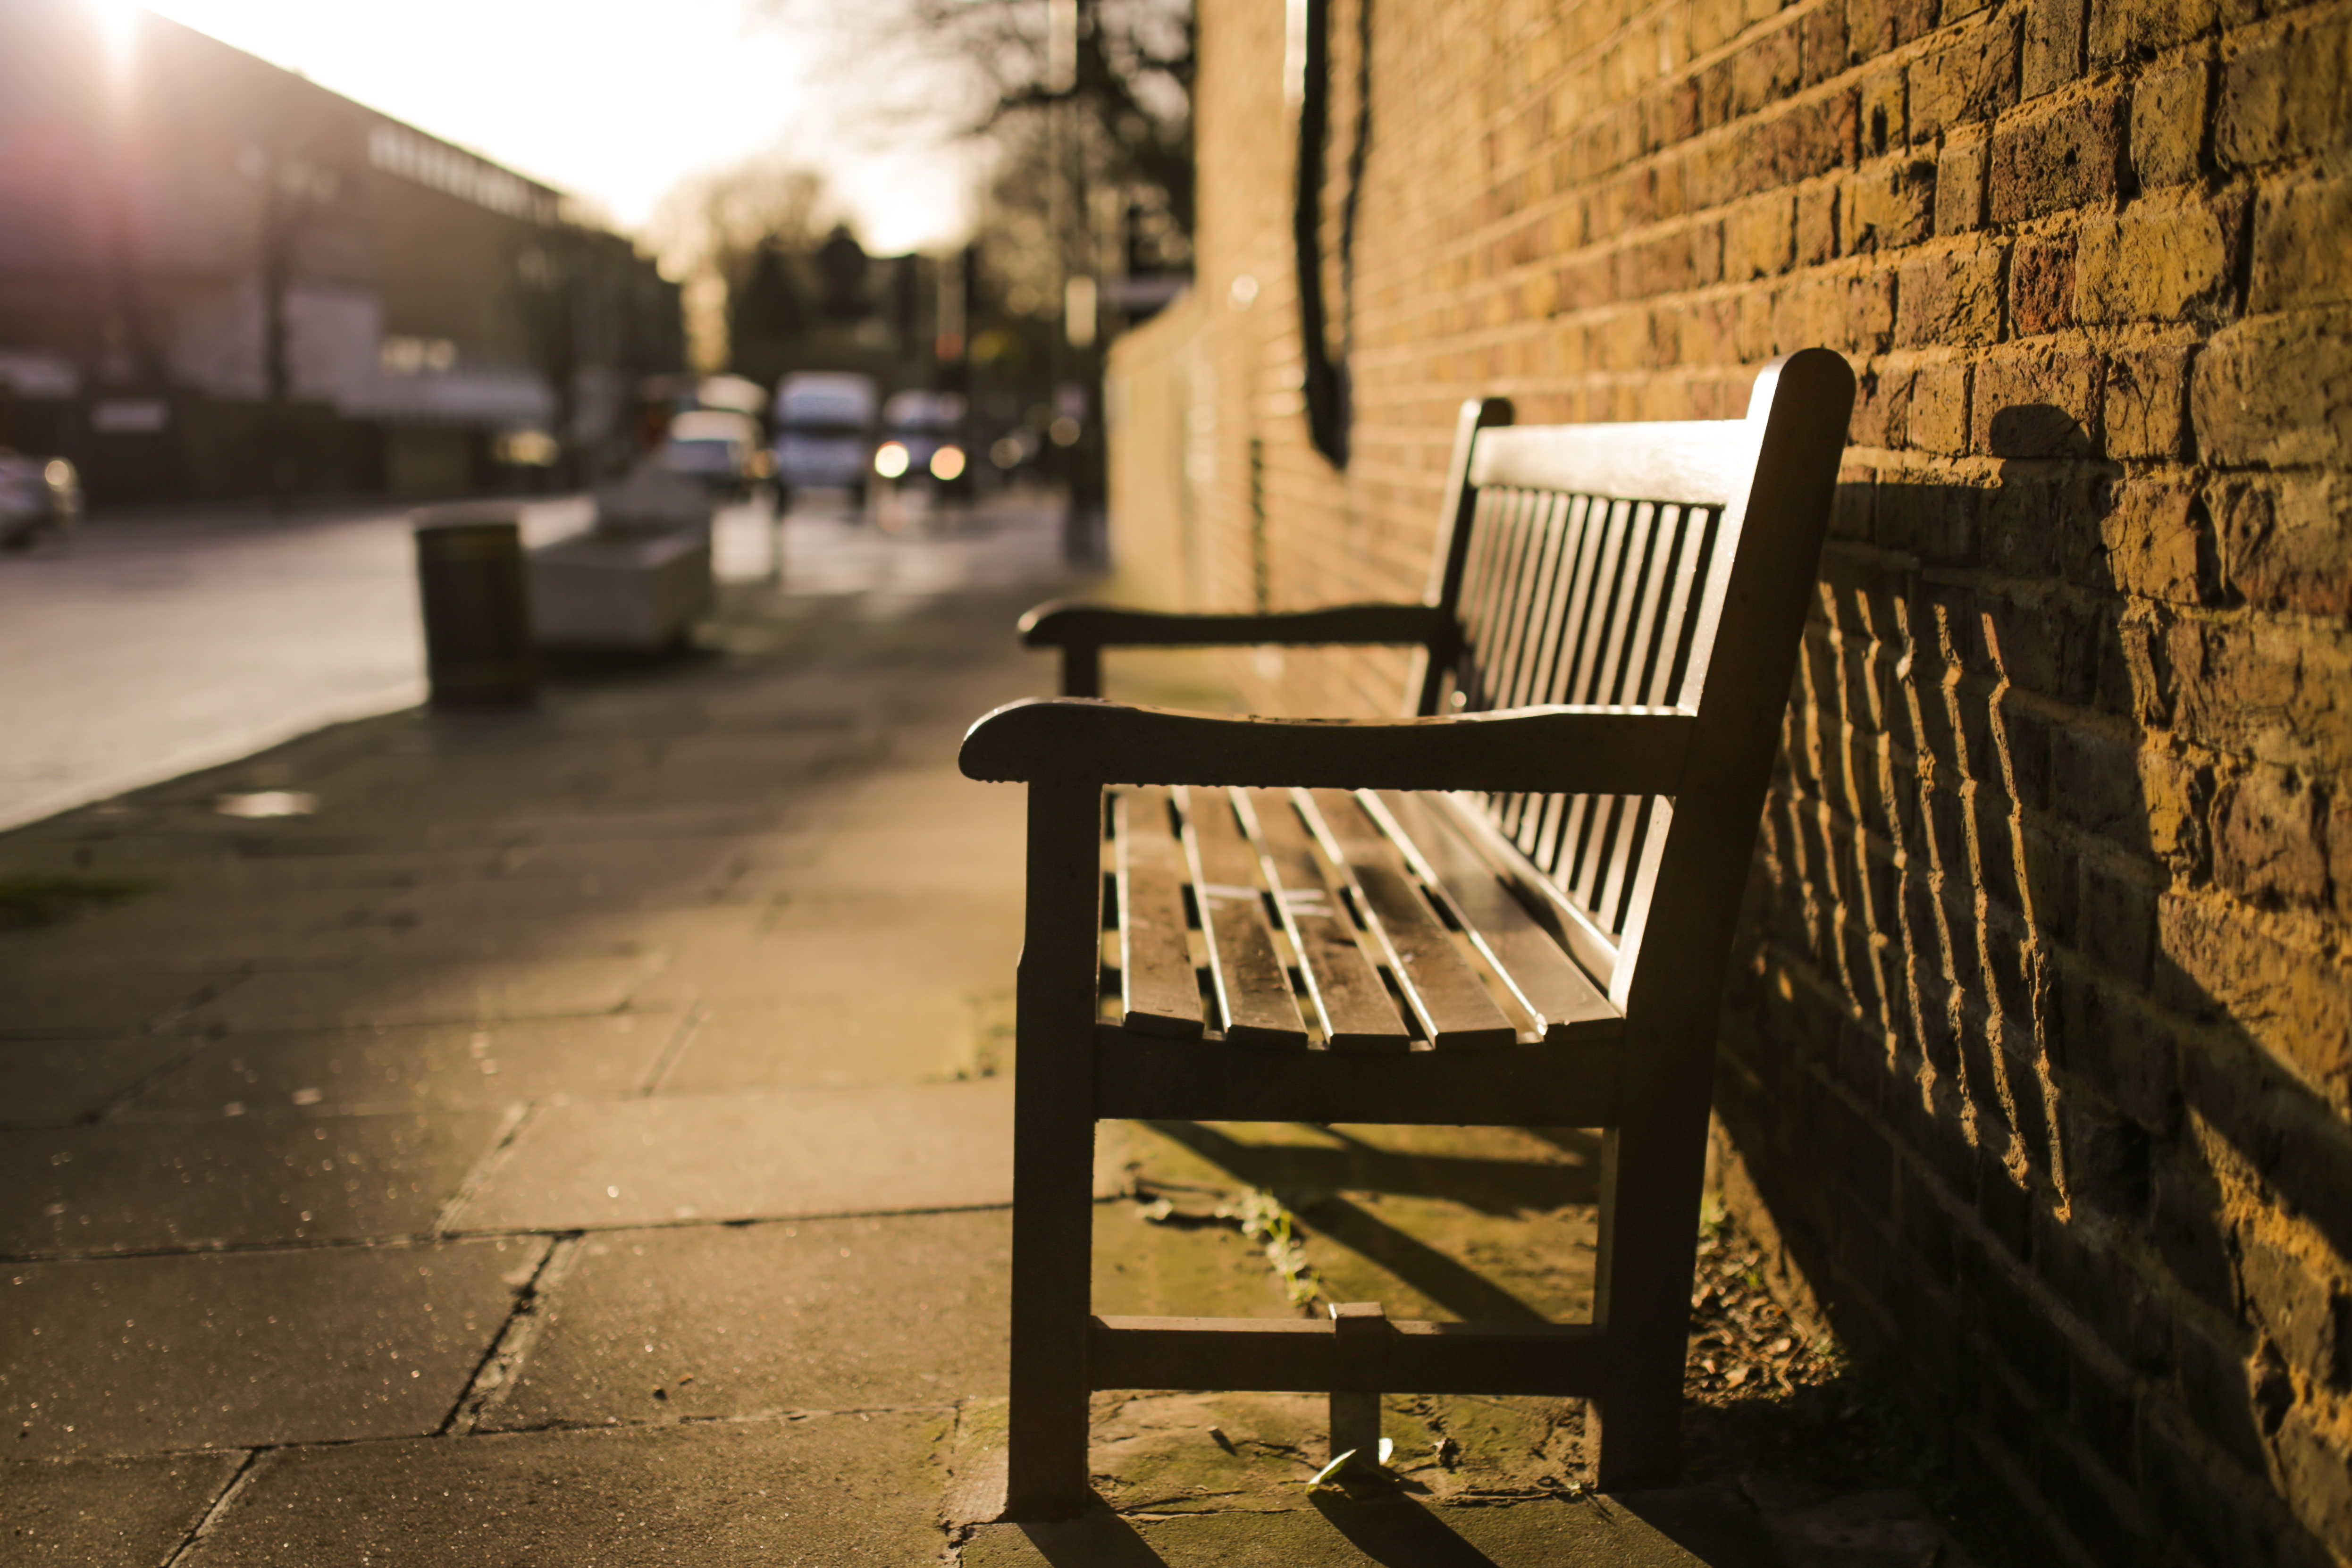 Bench, Chair, Road, Seats, Street, HQ Photo